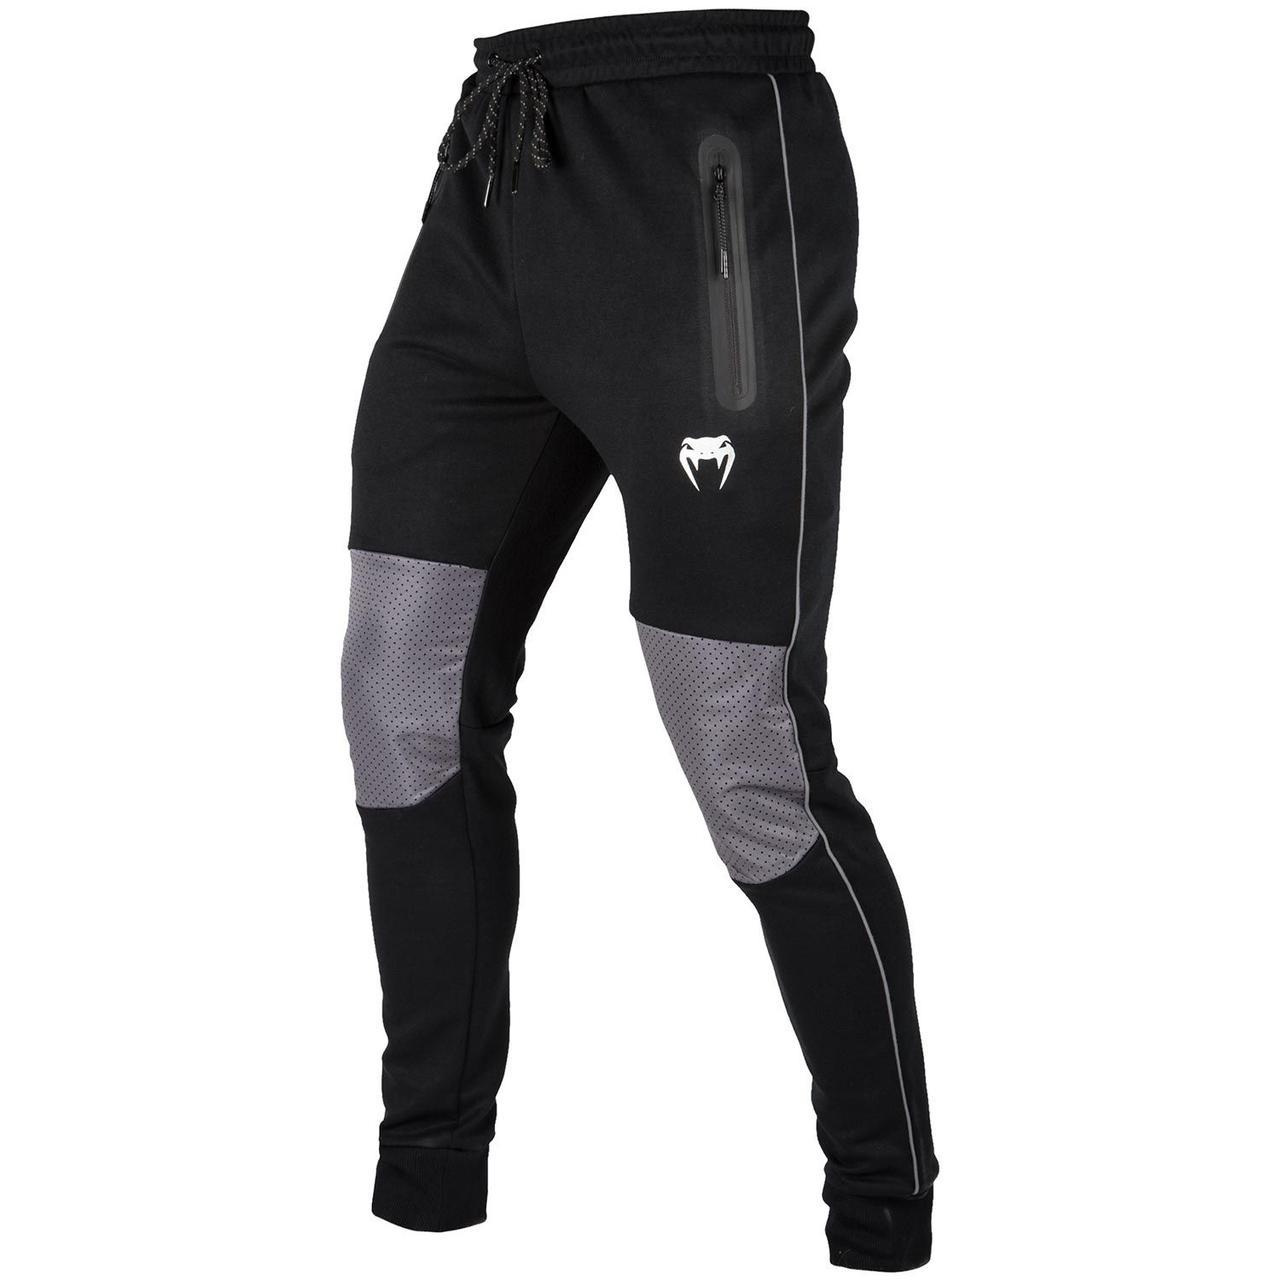 Спортивные штаны Venum Laser Pants Black